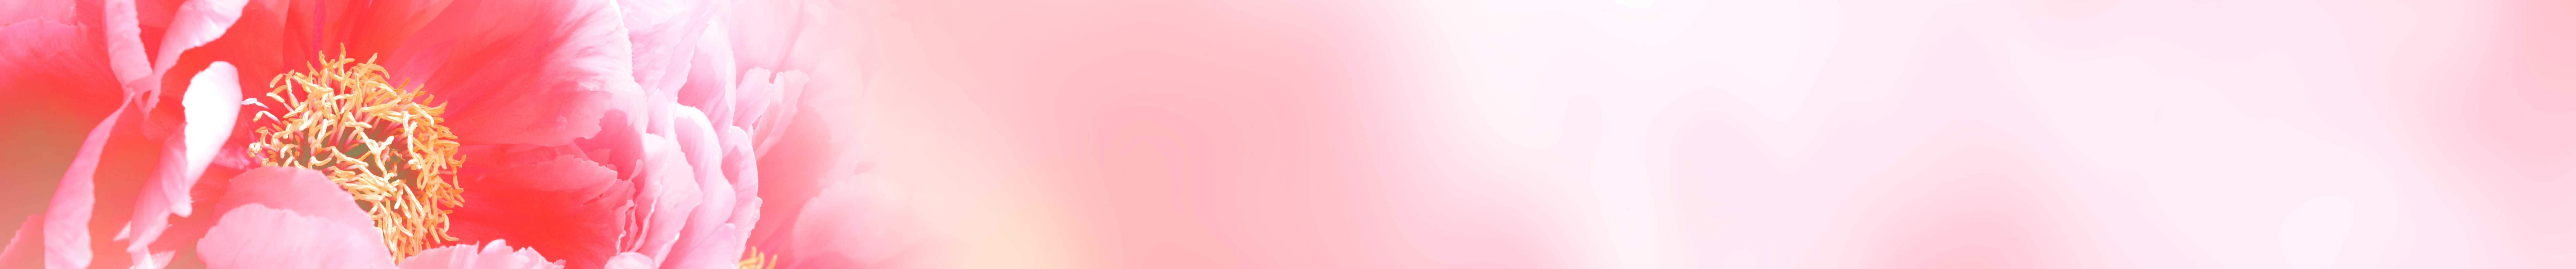 Rose Panorama_188110854-1AS - Kopie